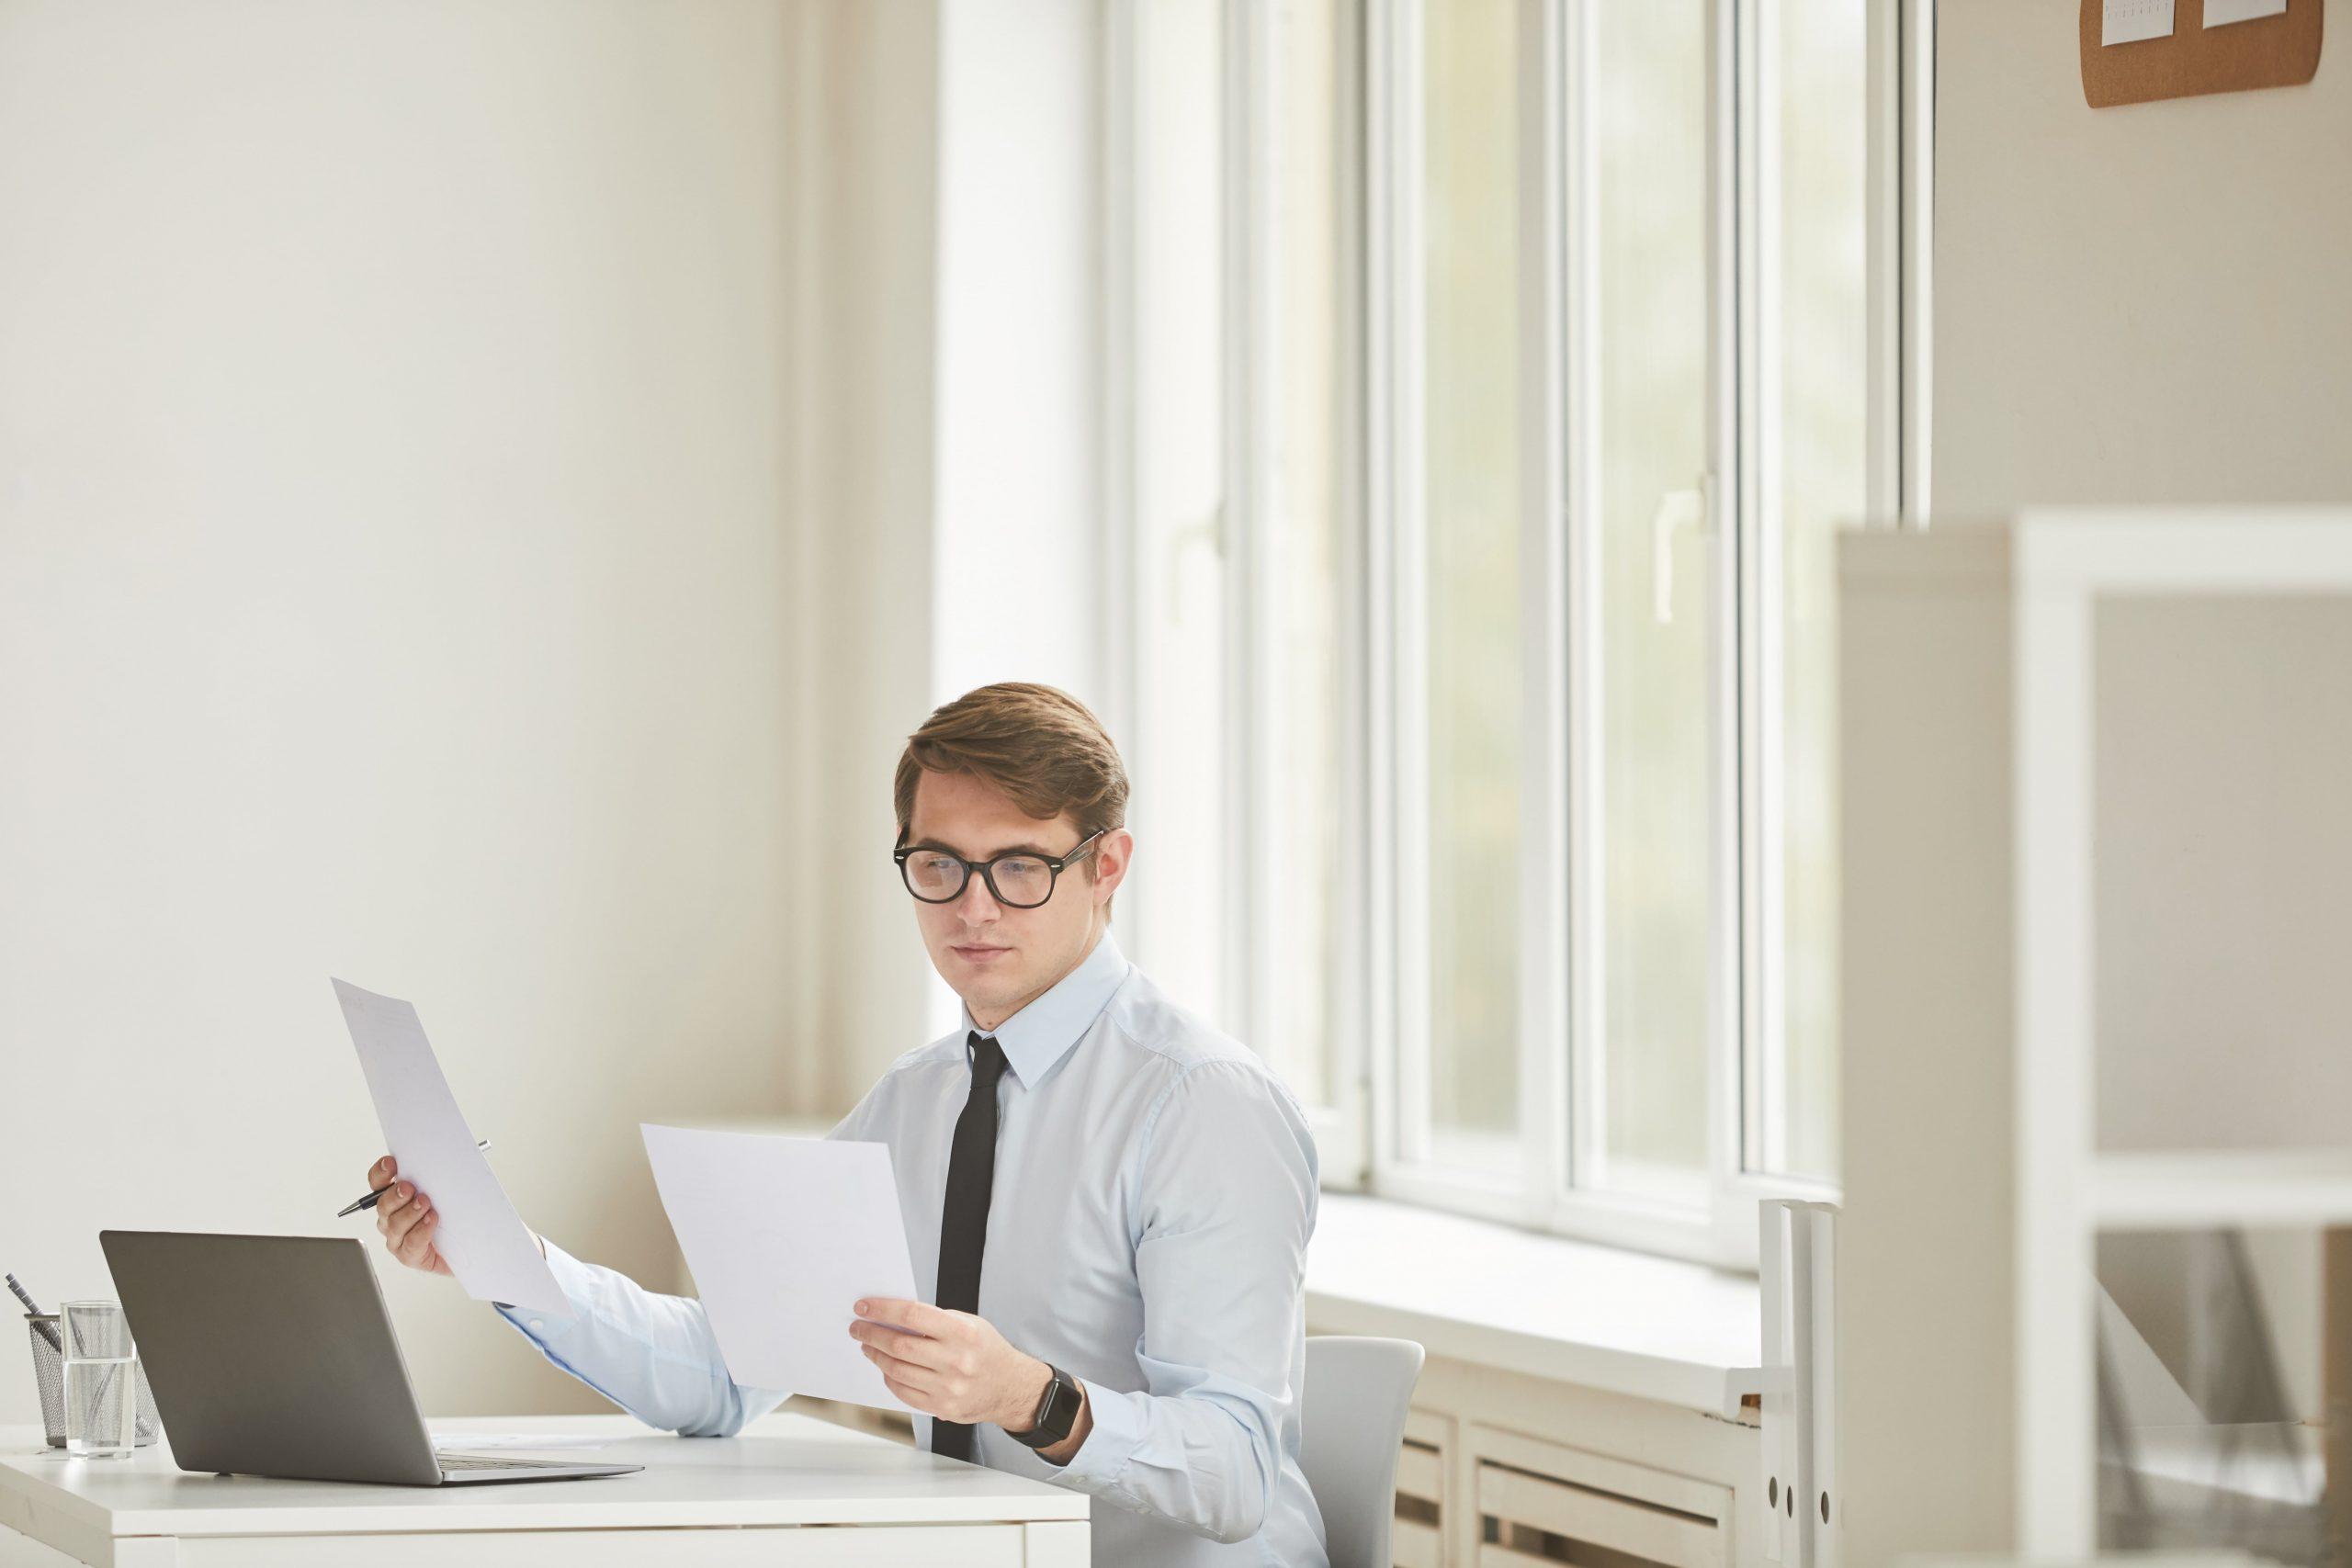 successful-businessman-reading-documents-at-desk-6SAYA9V-min